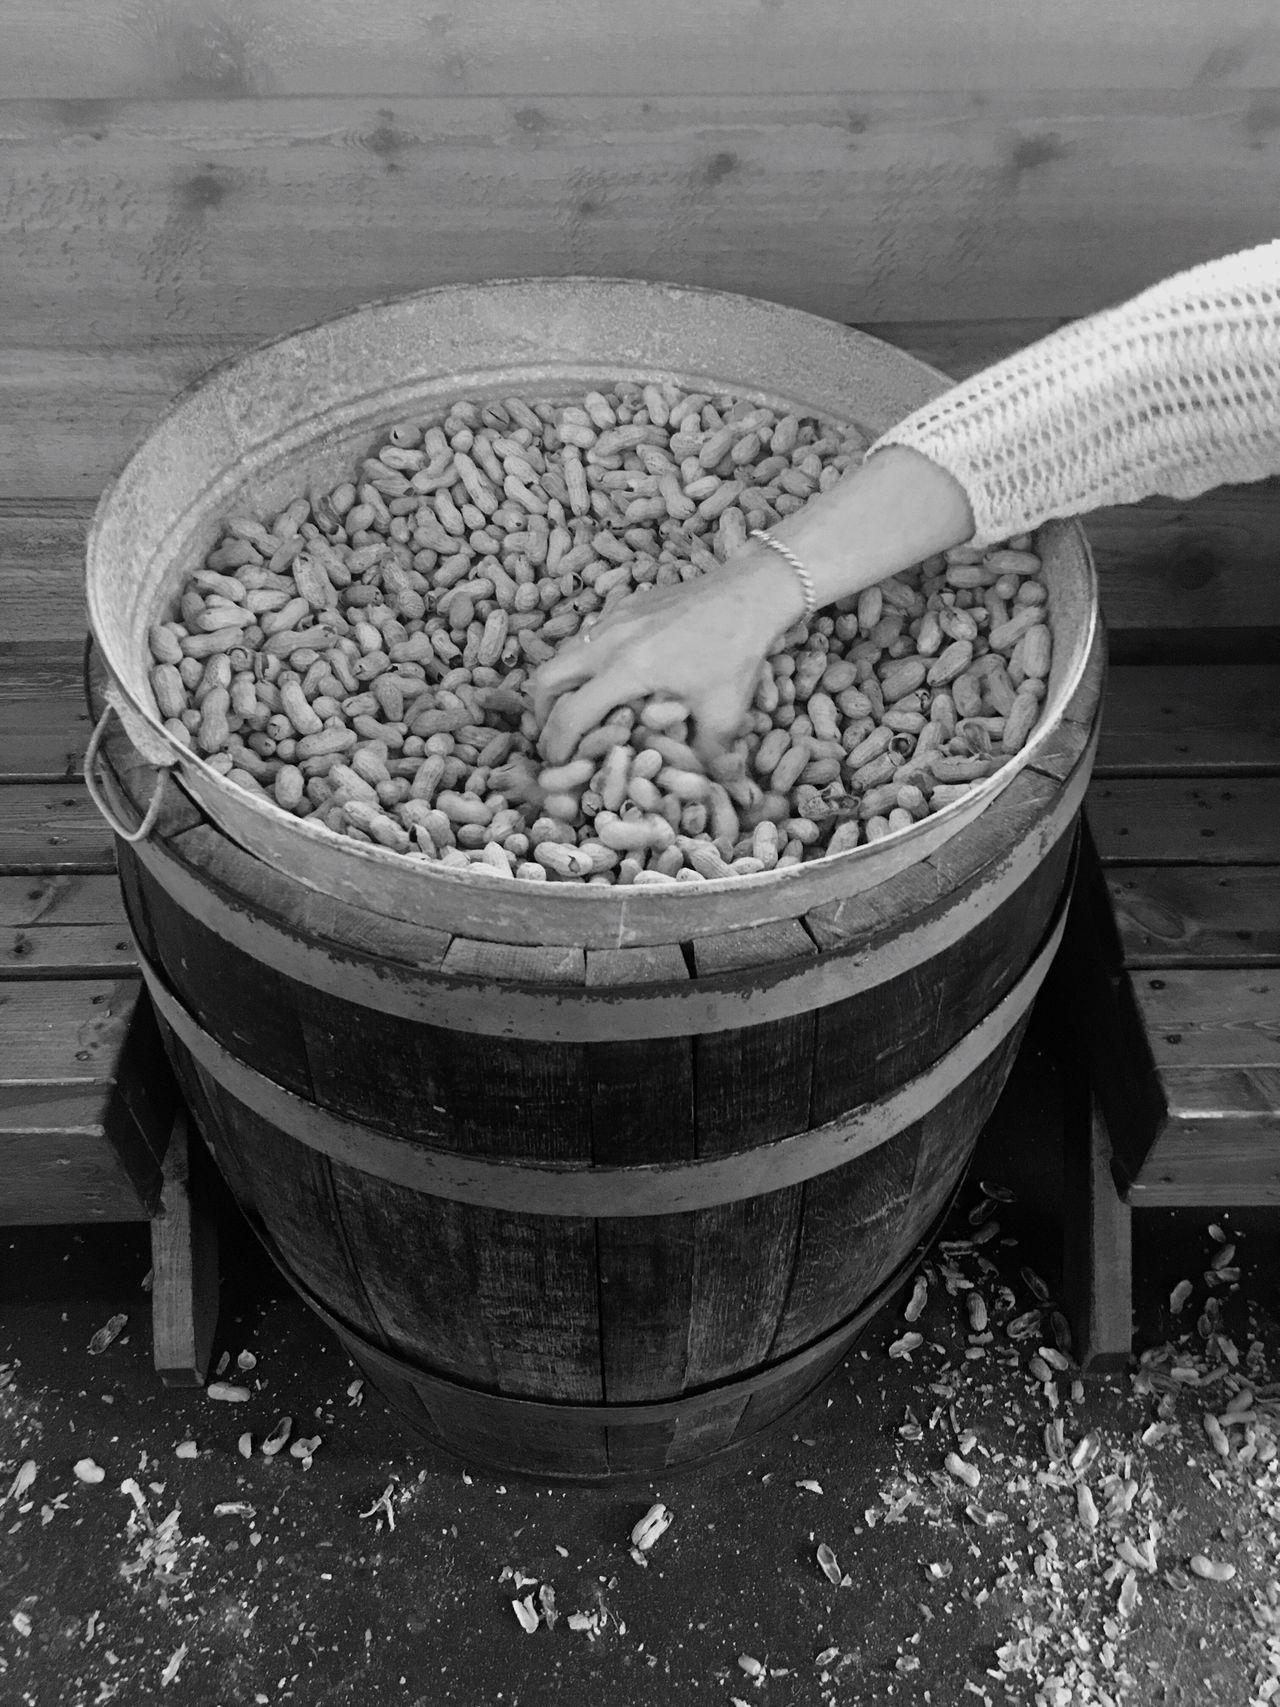 Bowl Day No People Outdoors Peanuts Barrel Hand Arm Reaching Grabbing A Bite Grabbing